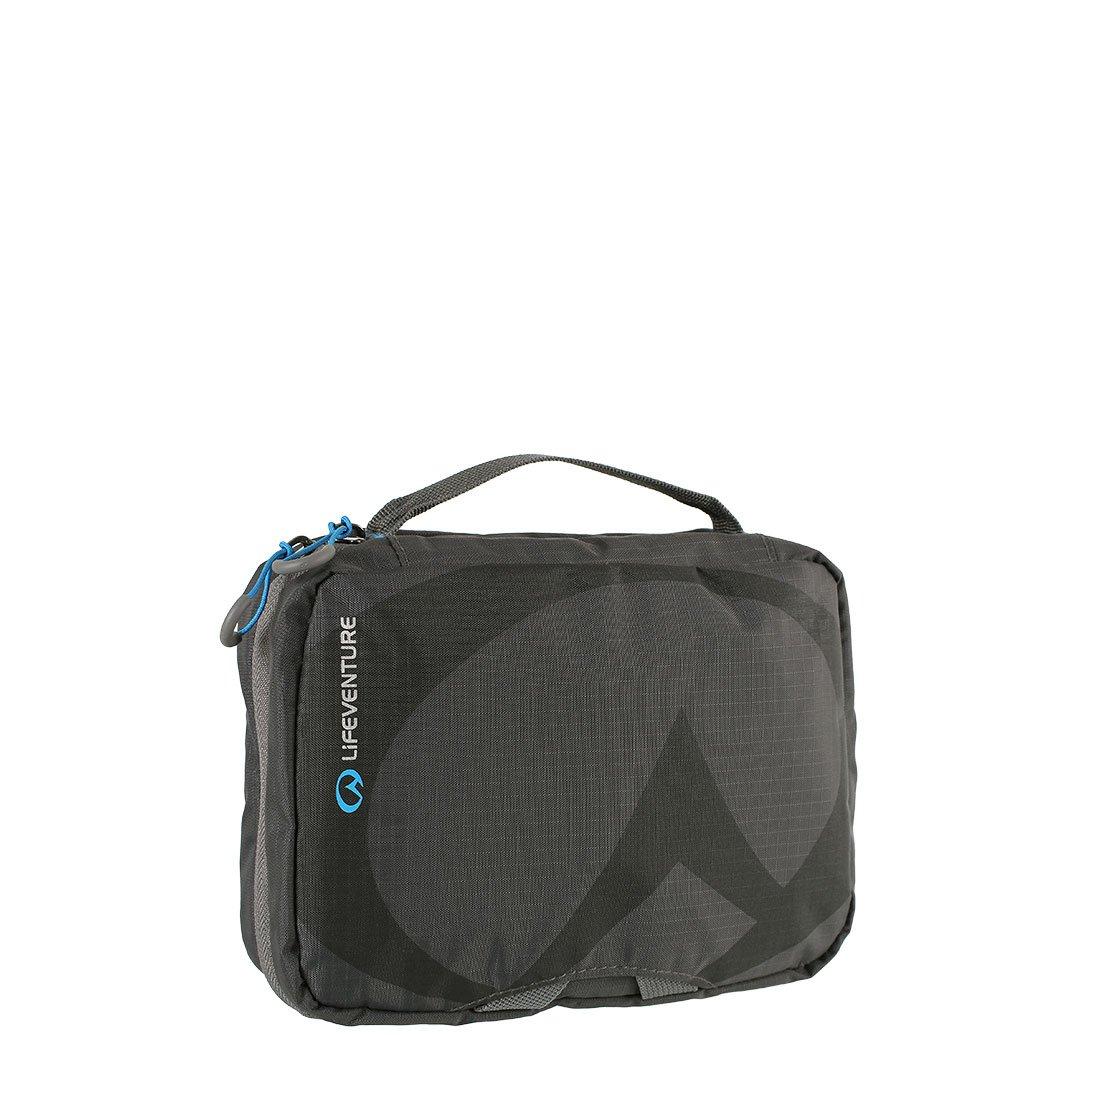 Small Travel Trailer Interiors: Small Hanging Wash Bag